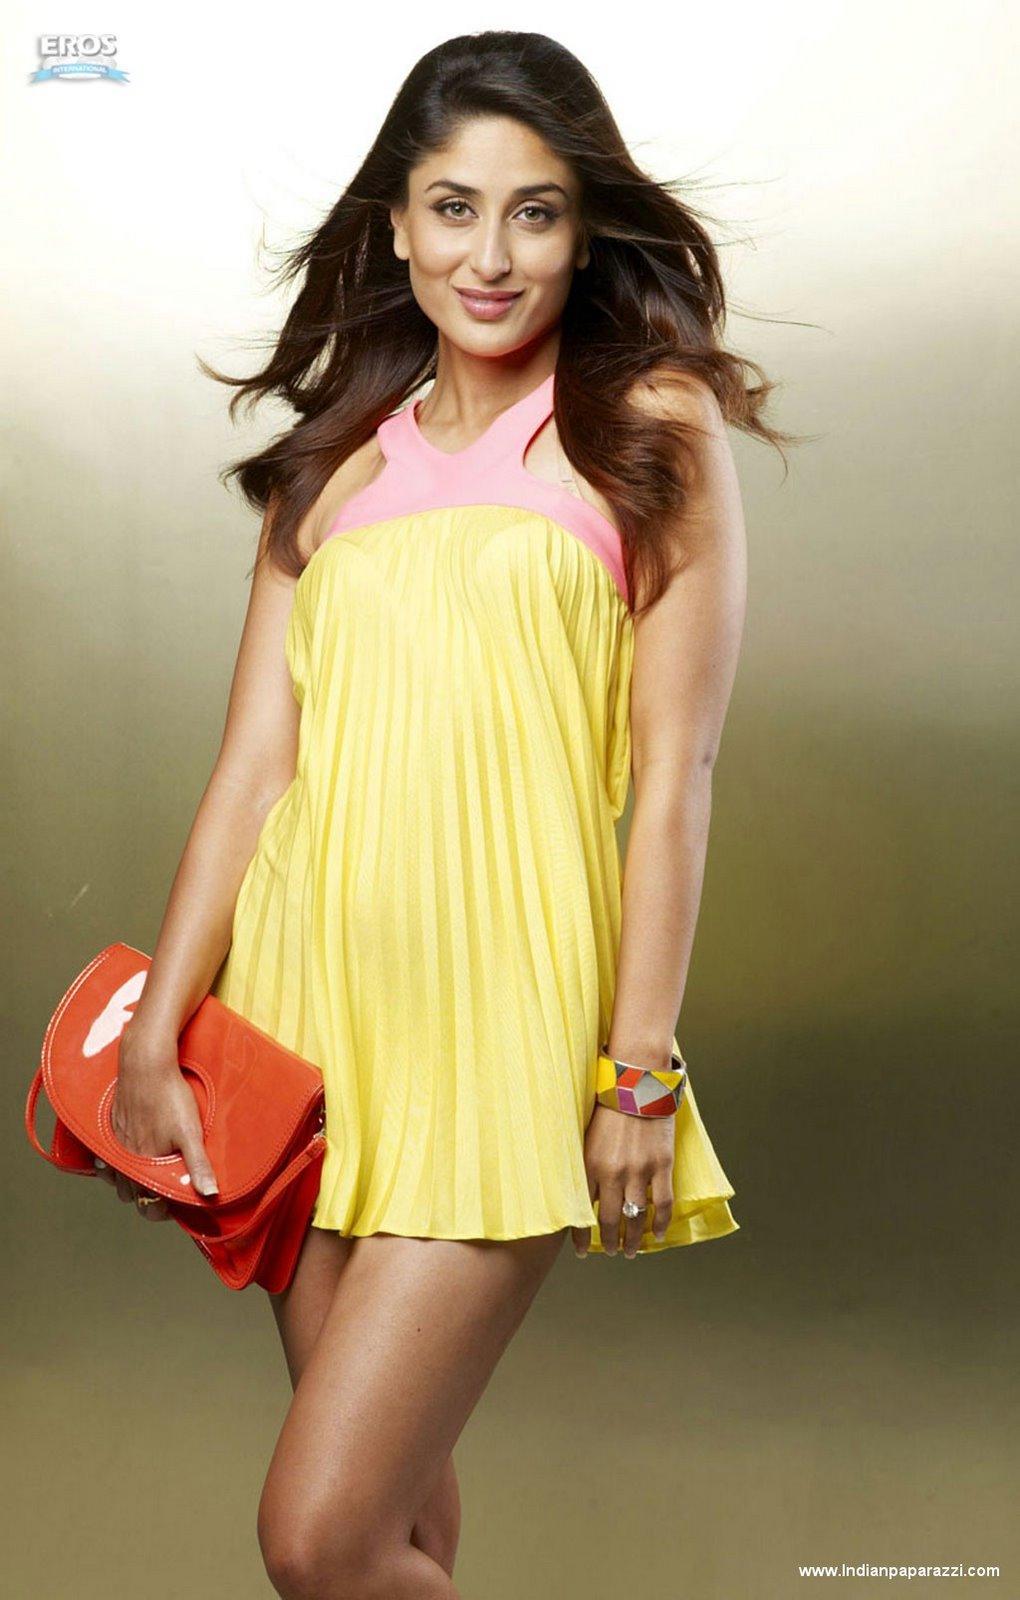 Beauty Galore HD : Hansika Motwani Hot Inner Thigh Upskirt